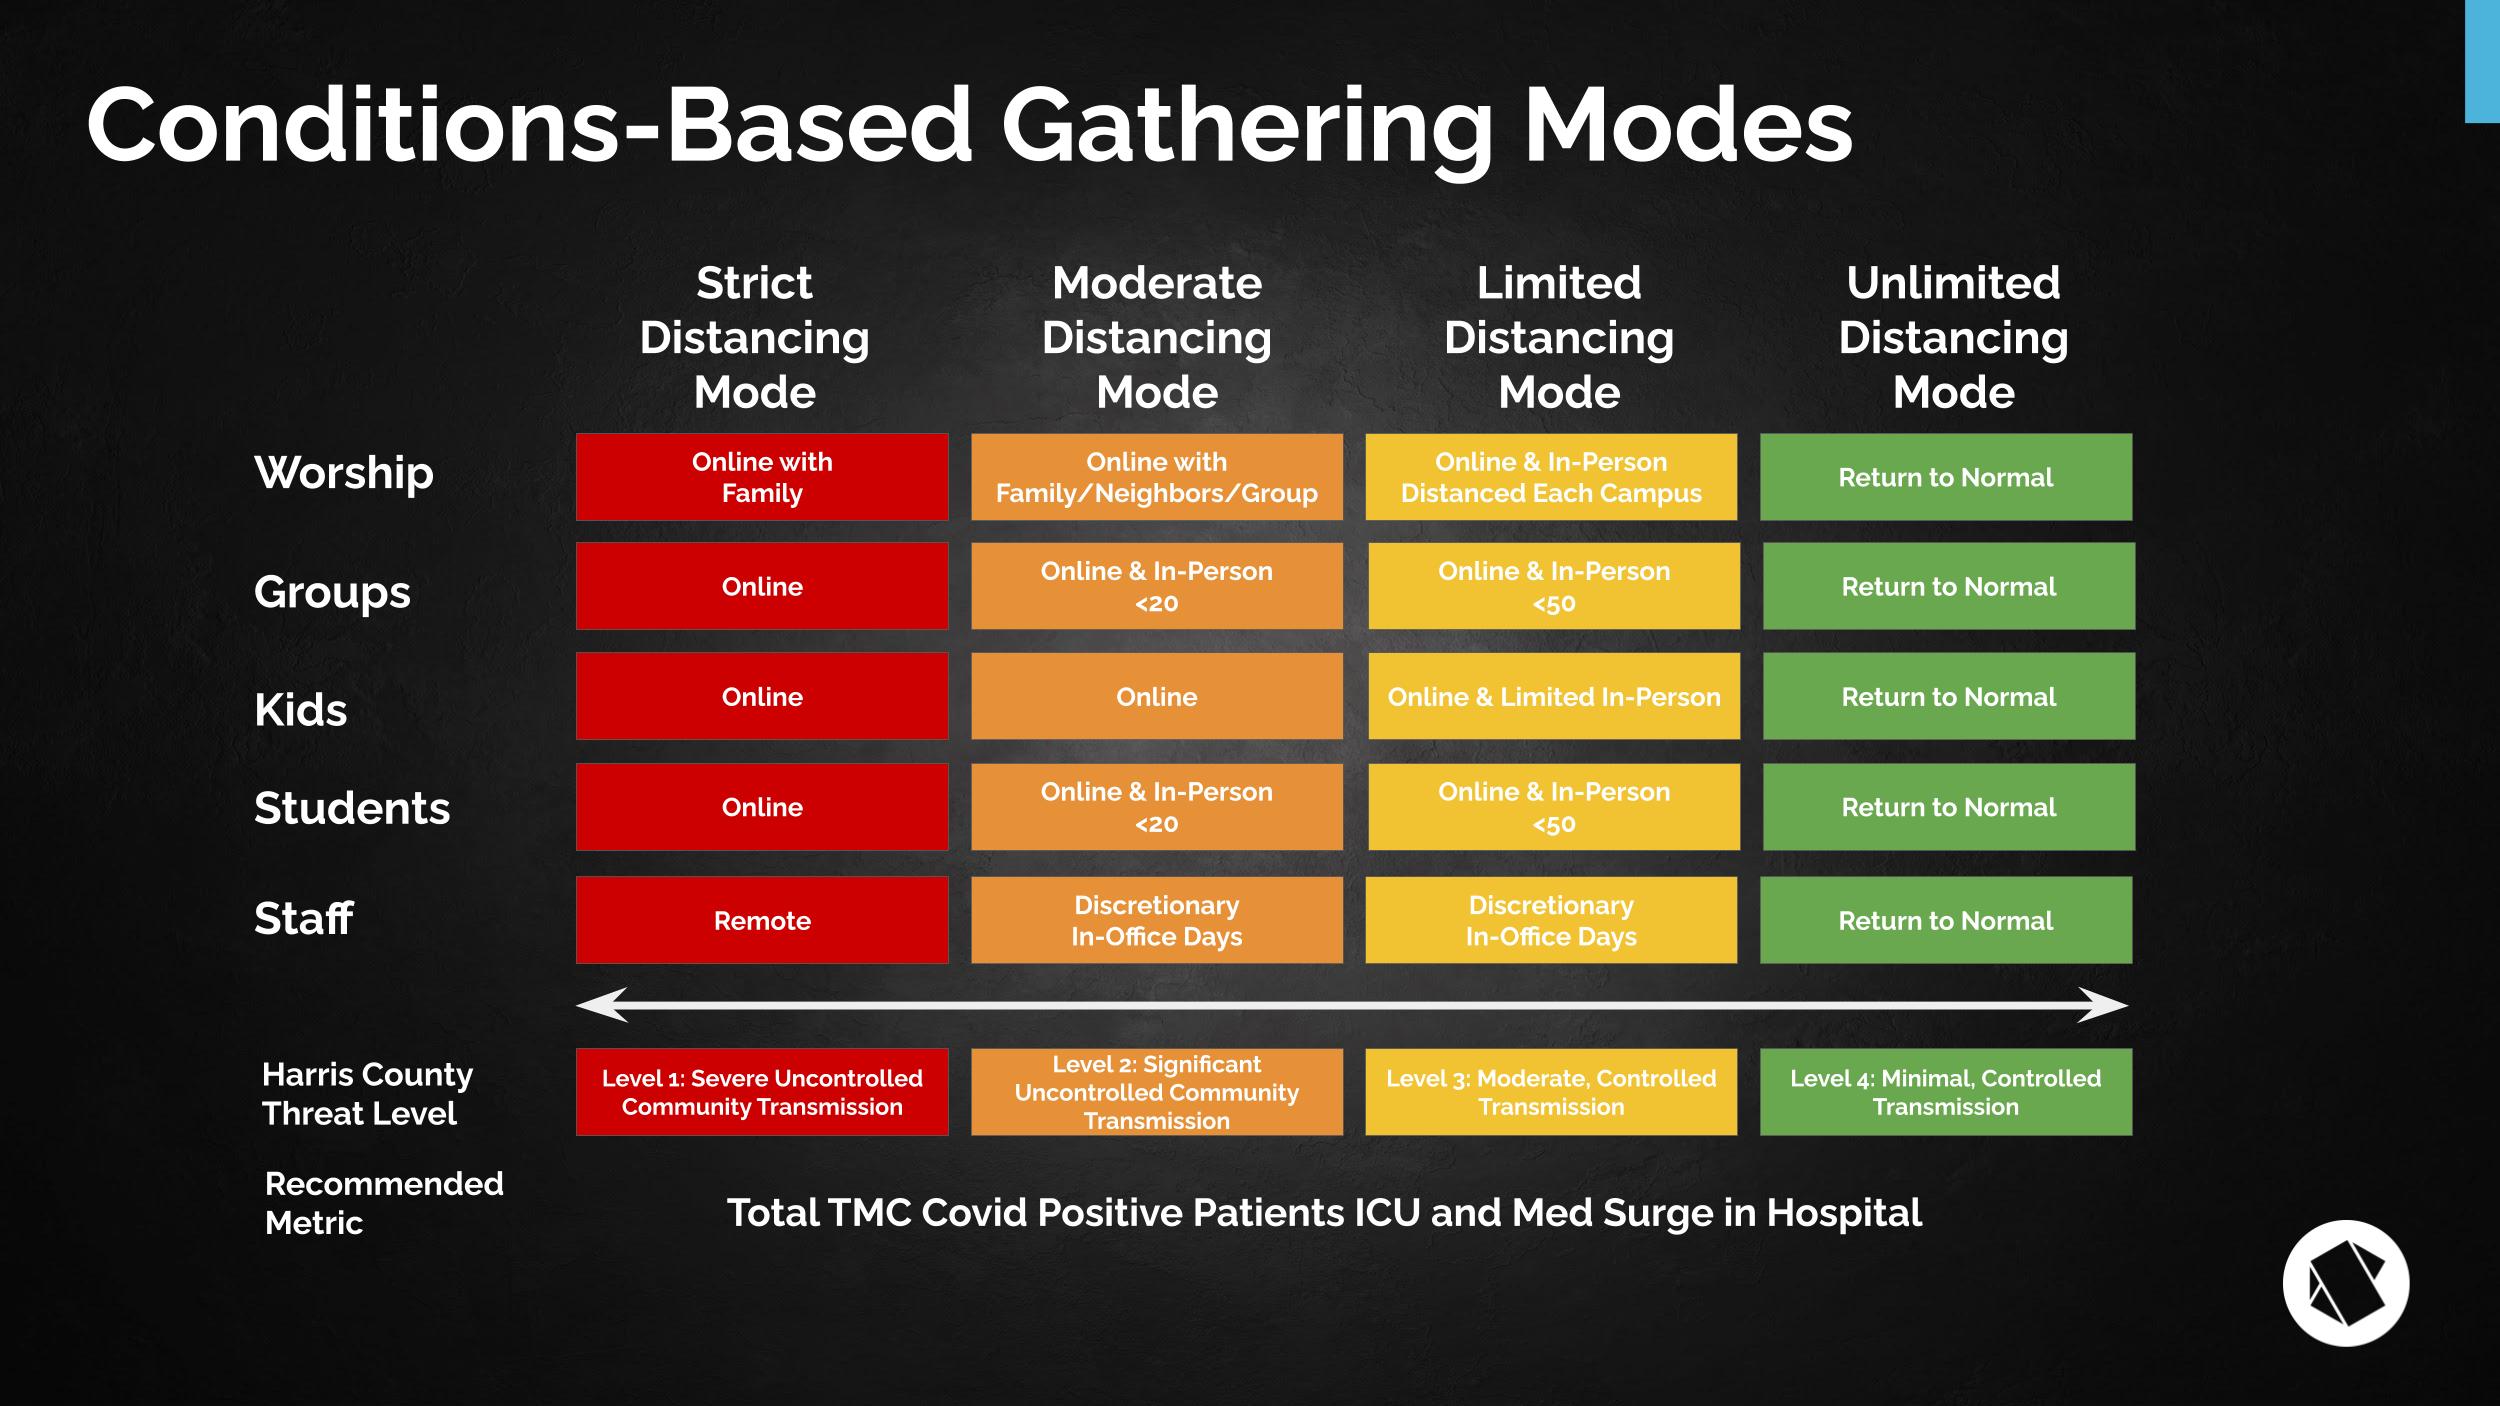 CBG Modes 2